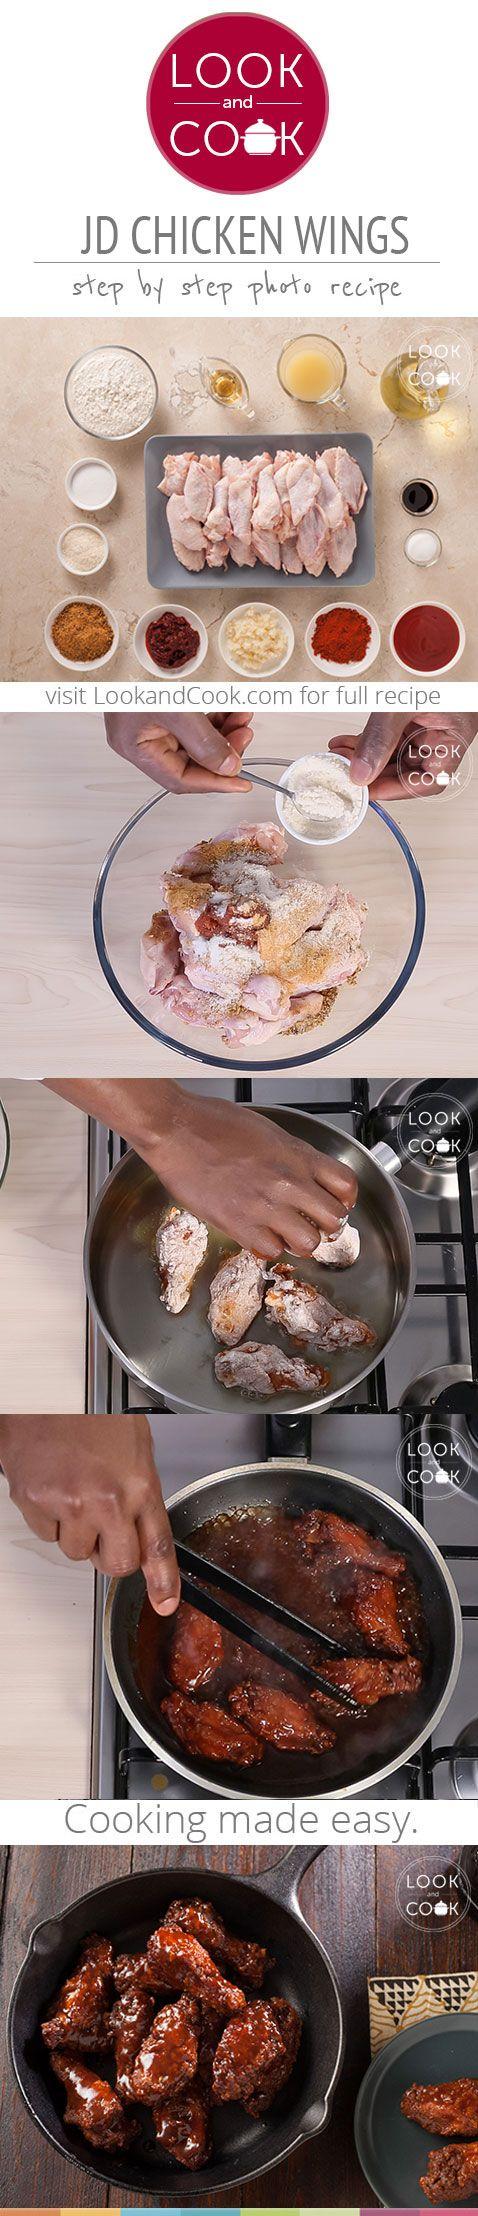 how to make chicken pakistani recipe